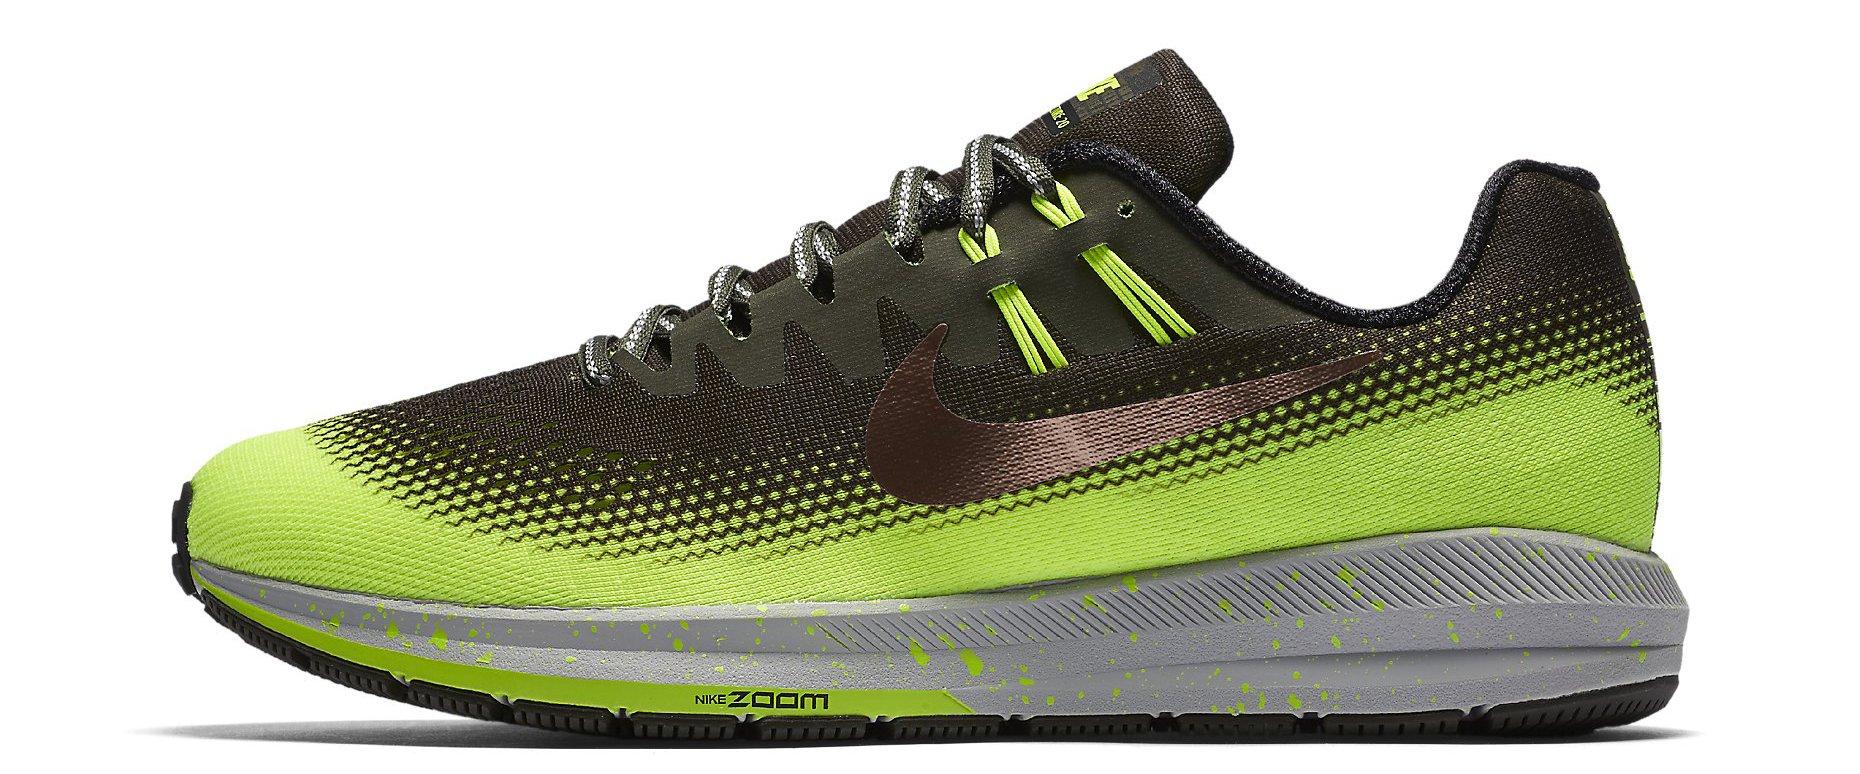 Běžecká obuv Nike Air Zoom Structure 20 Shield